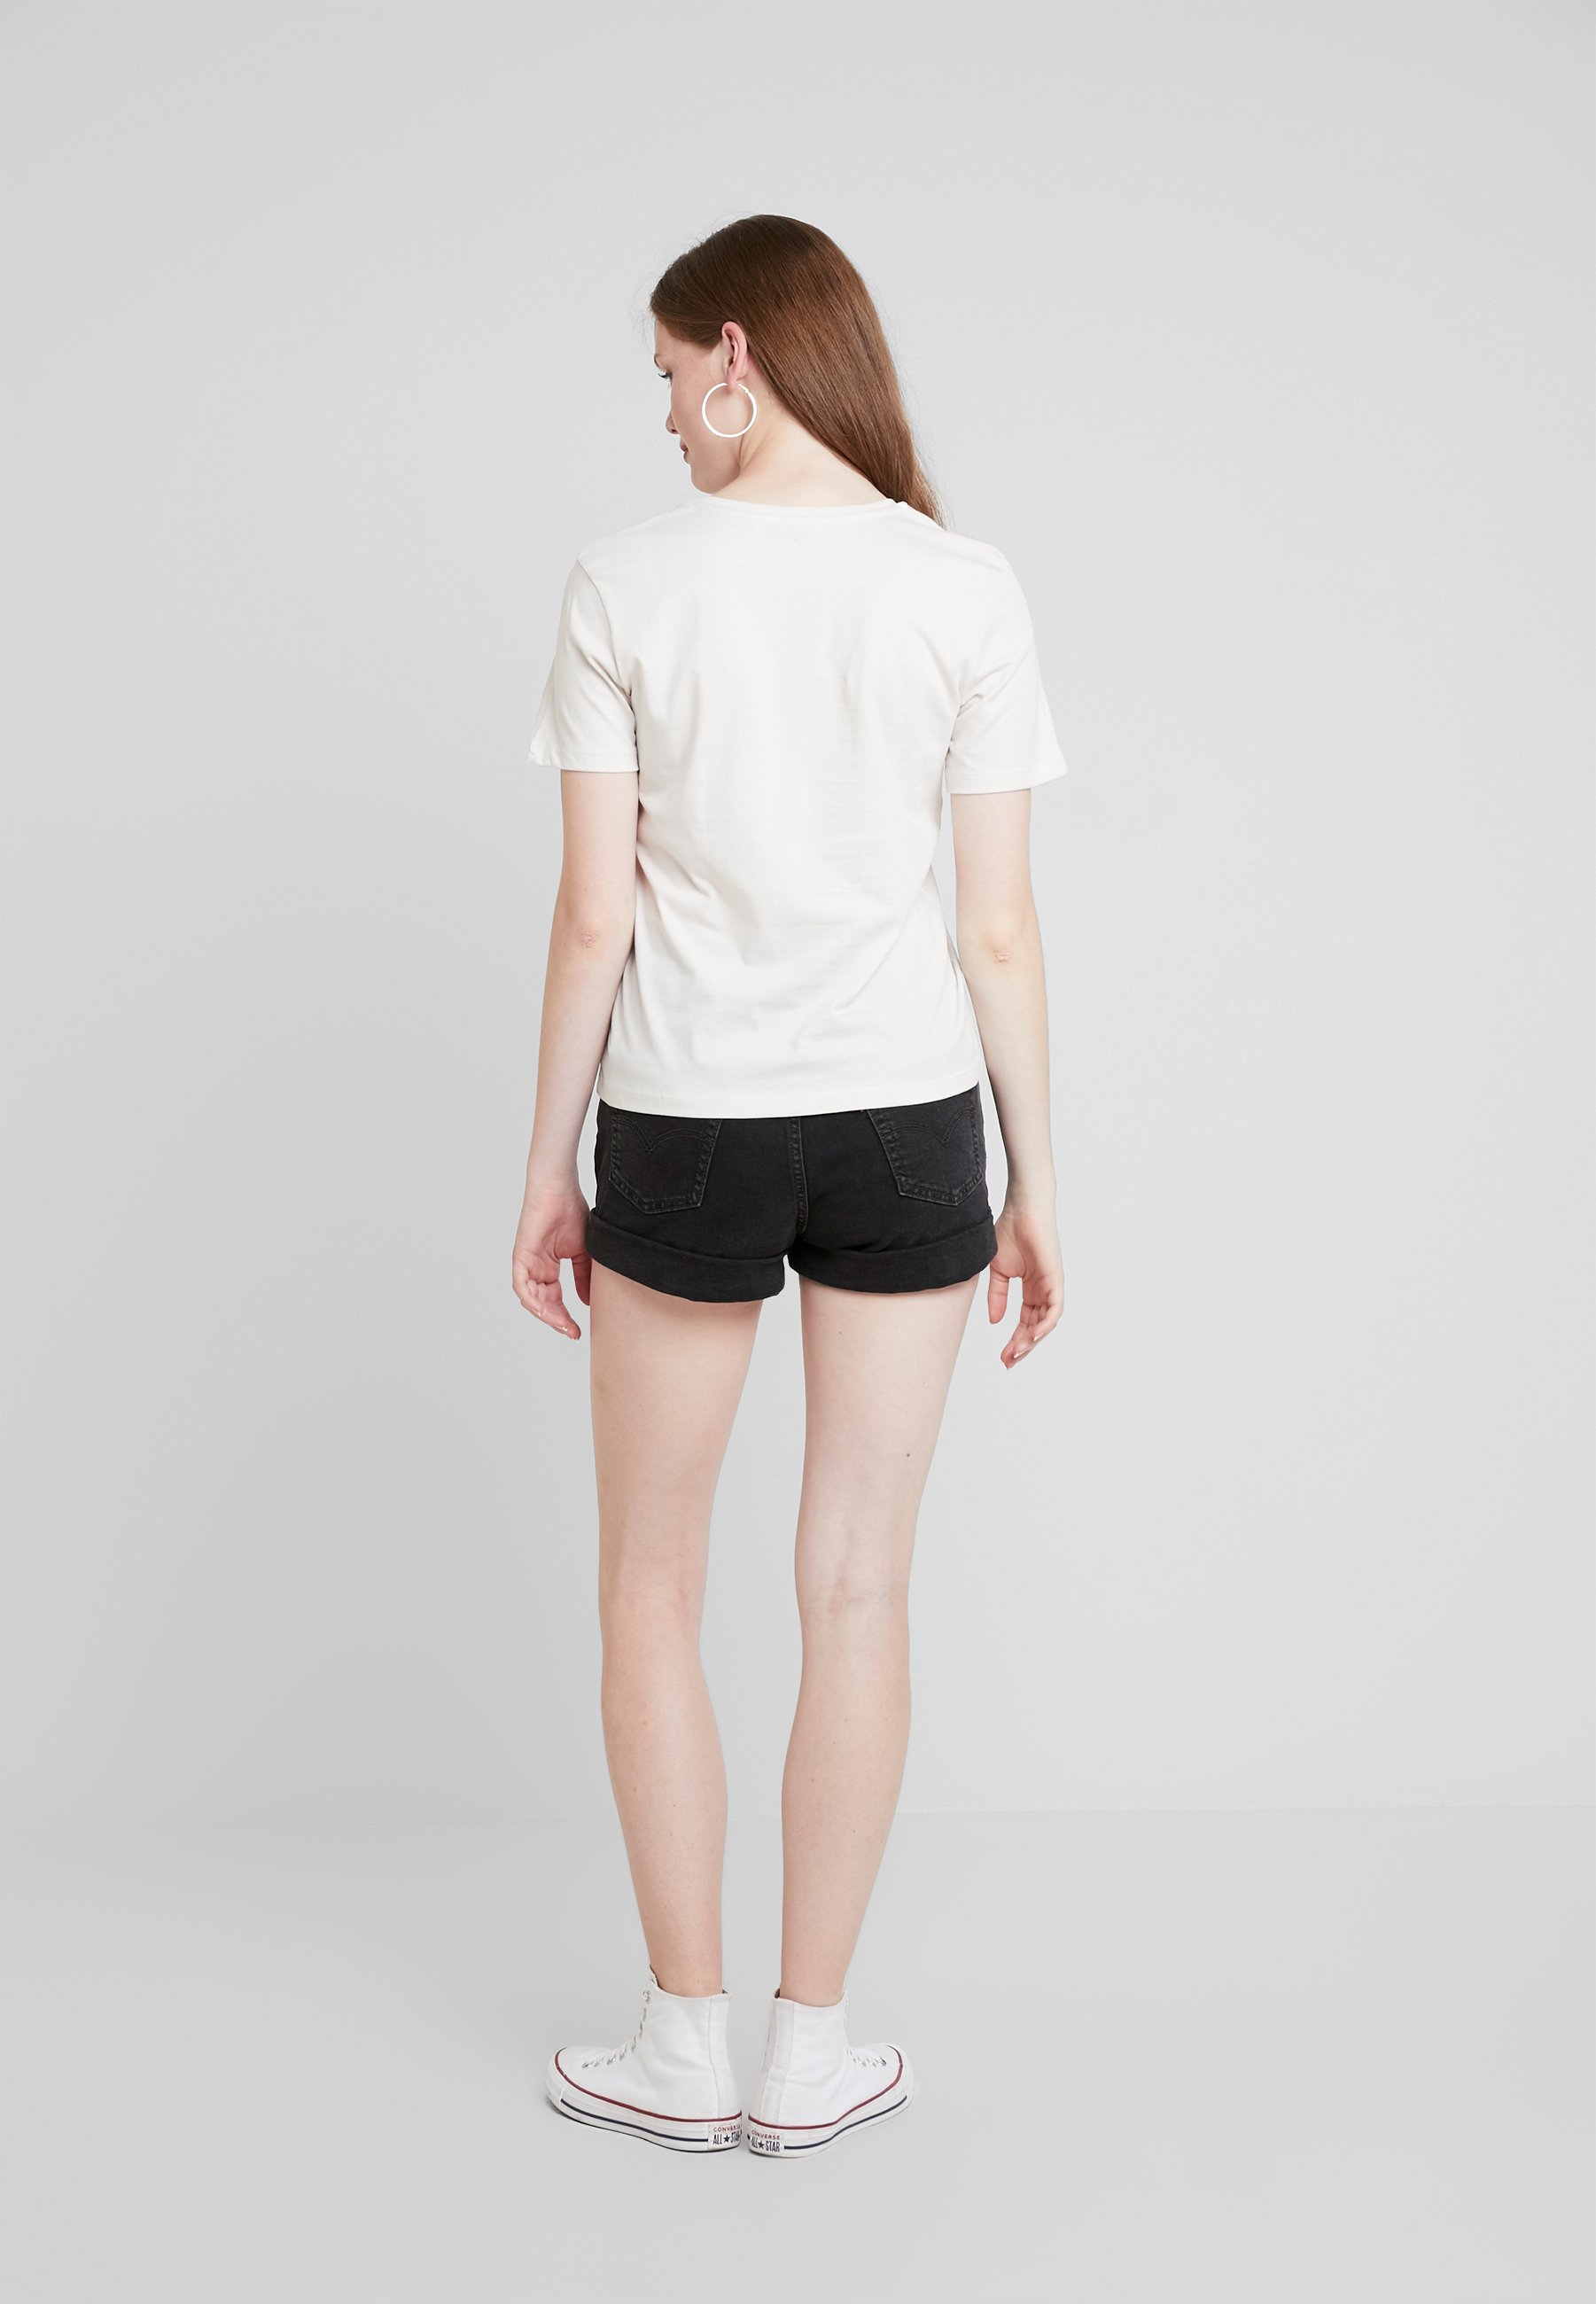 shirt amp;odd white T Even ImpriméOff bfvIY76gym